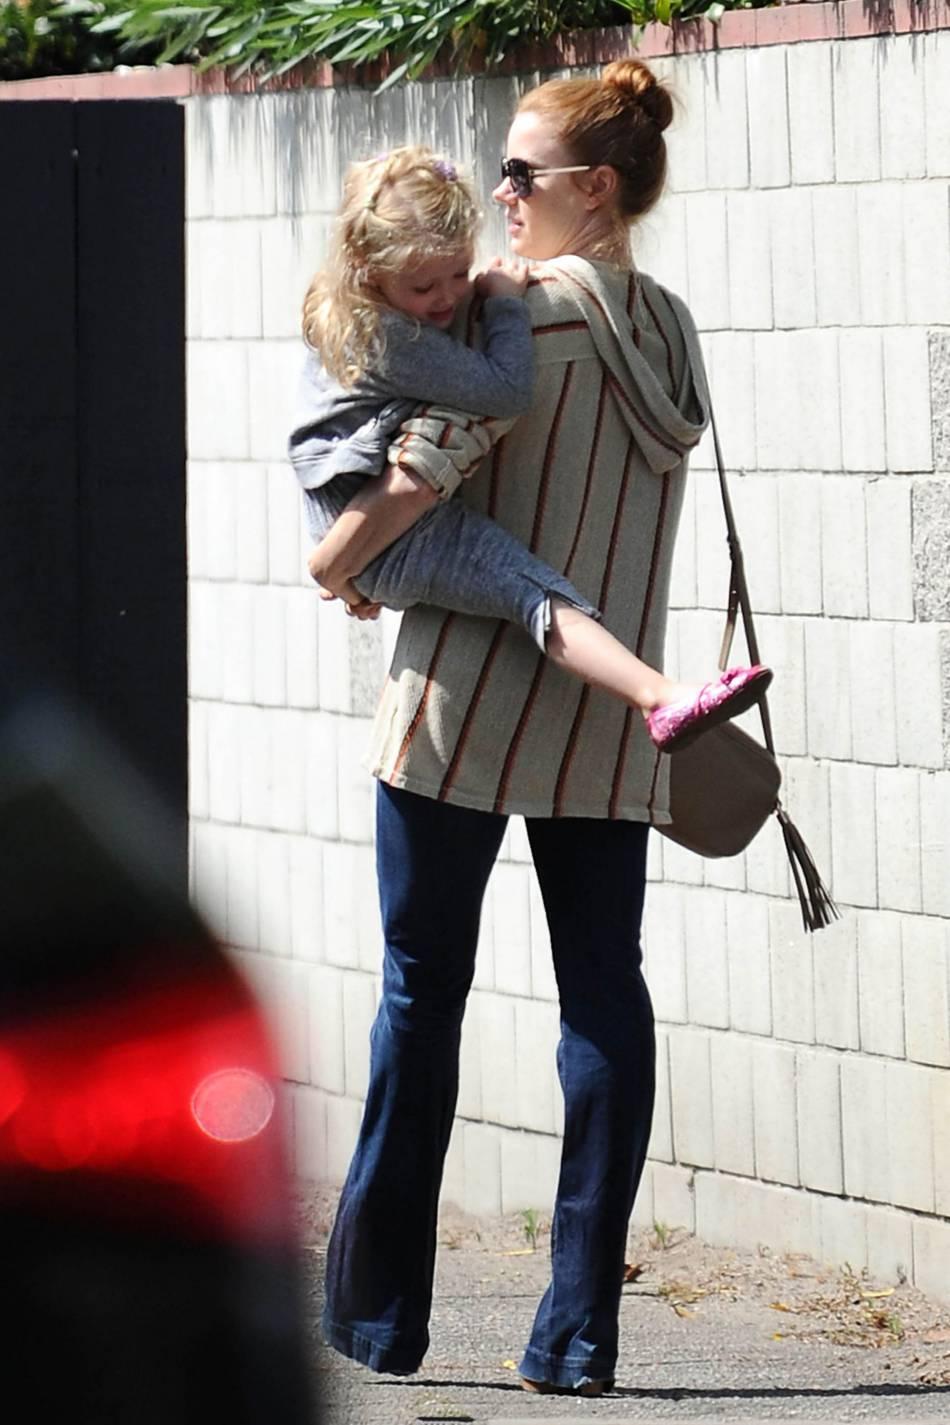 De leur union est née une petite fille, Aviana Olea, aujourd'hui âgée de cinq ans.